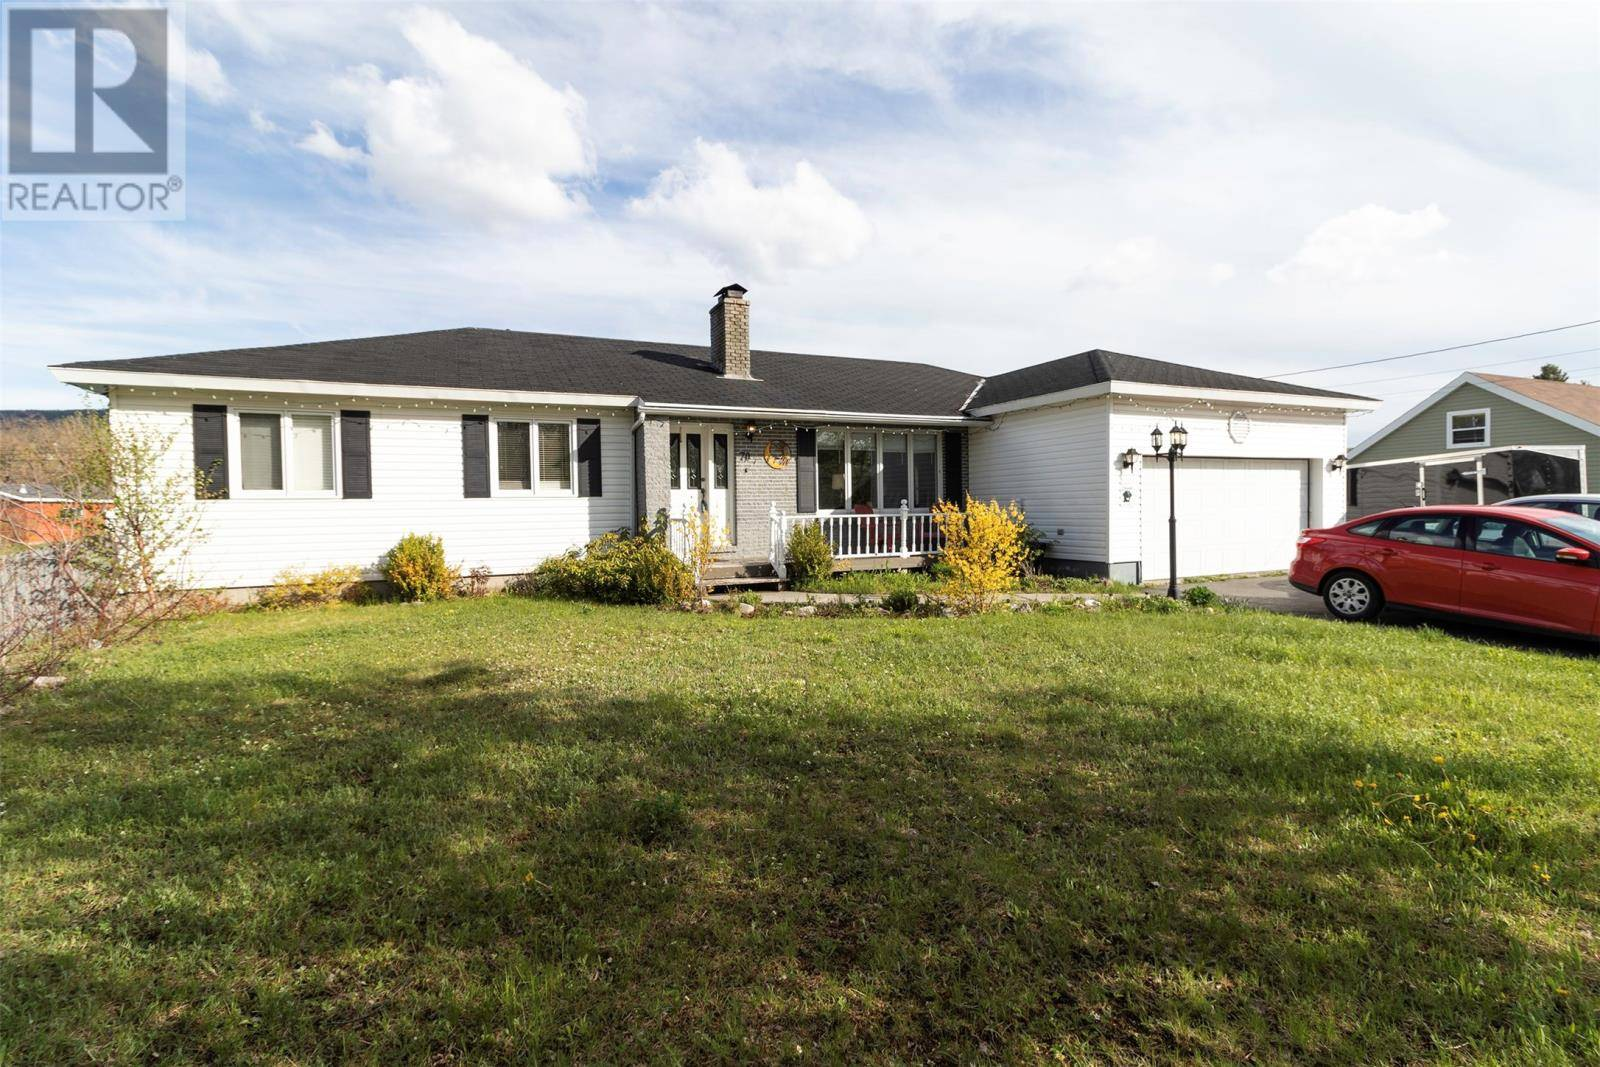 House for sale at 70 Midland Rw Pasadena Newfoundland - MLS: 1192693